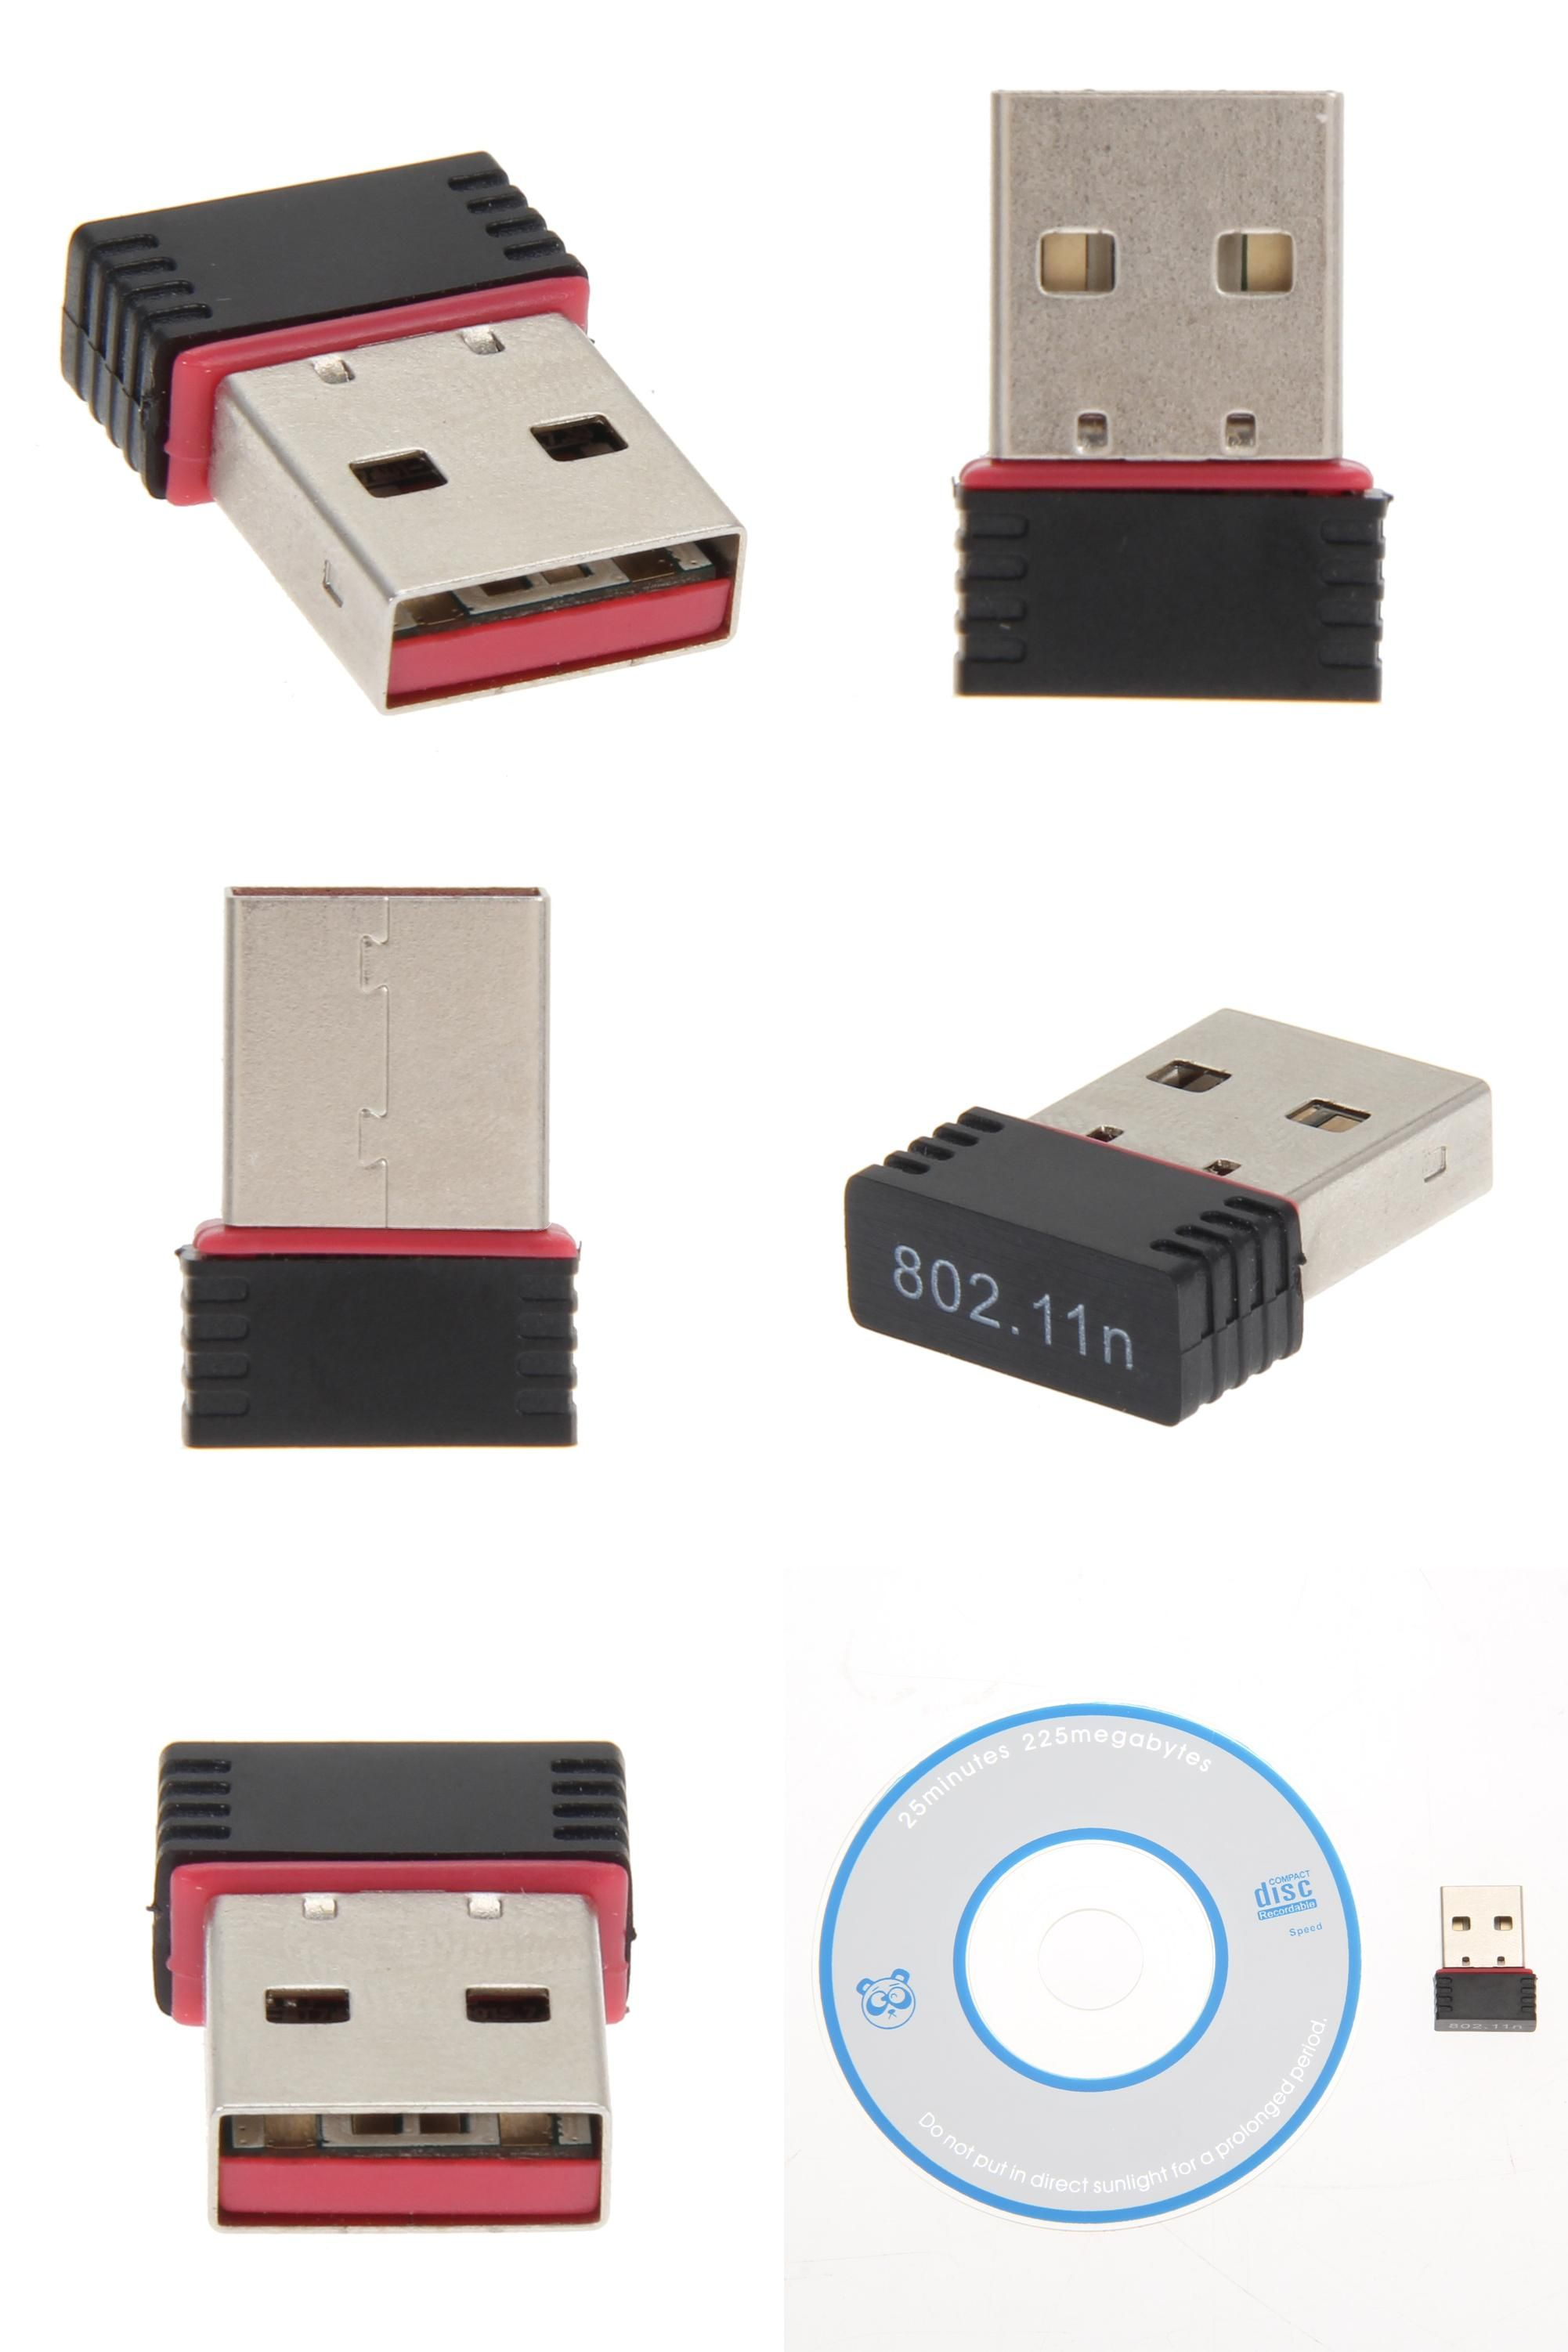 WUHFSHOPP Computer Accessories HA 300Mbps Mini USB 802.11n//g//b Wireless WiFi Network Card LAN Adapter with Antenna